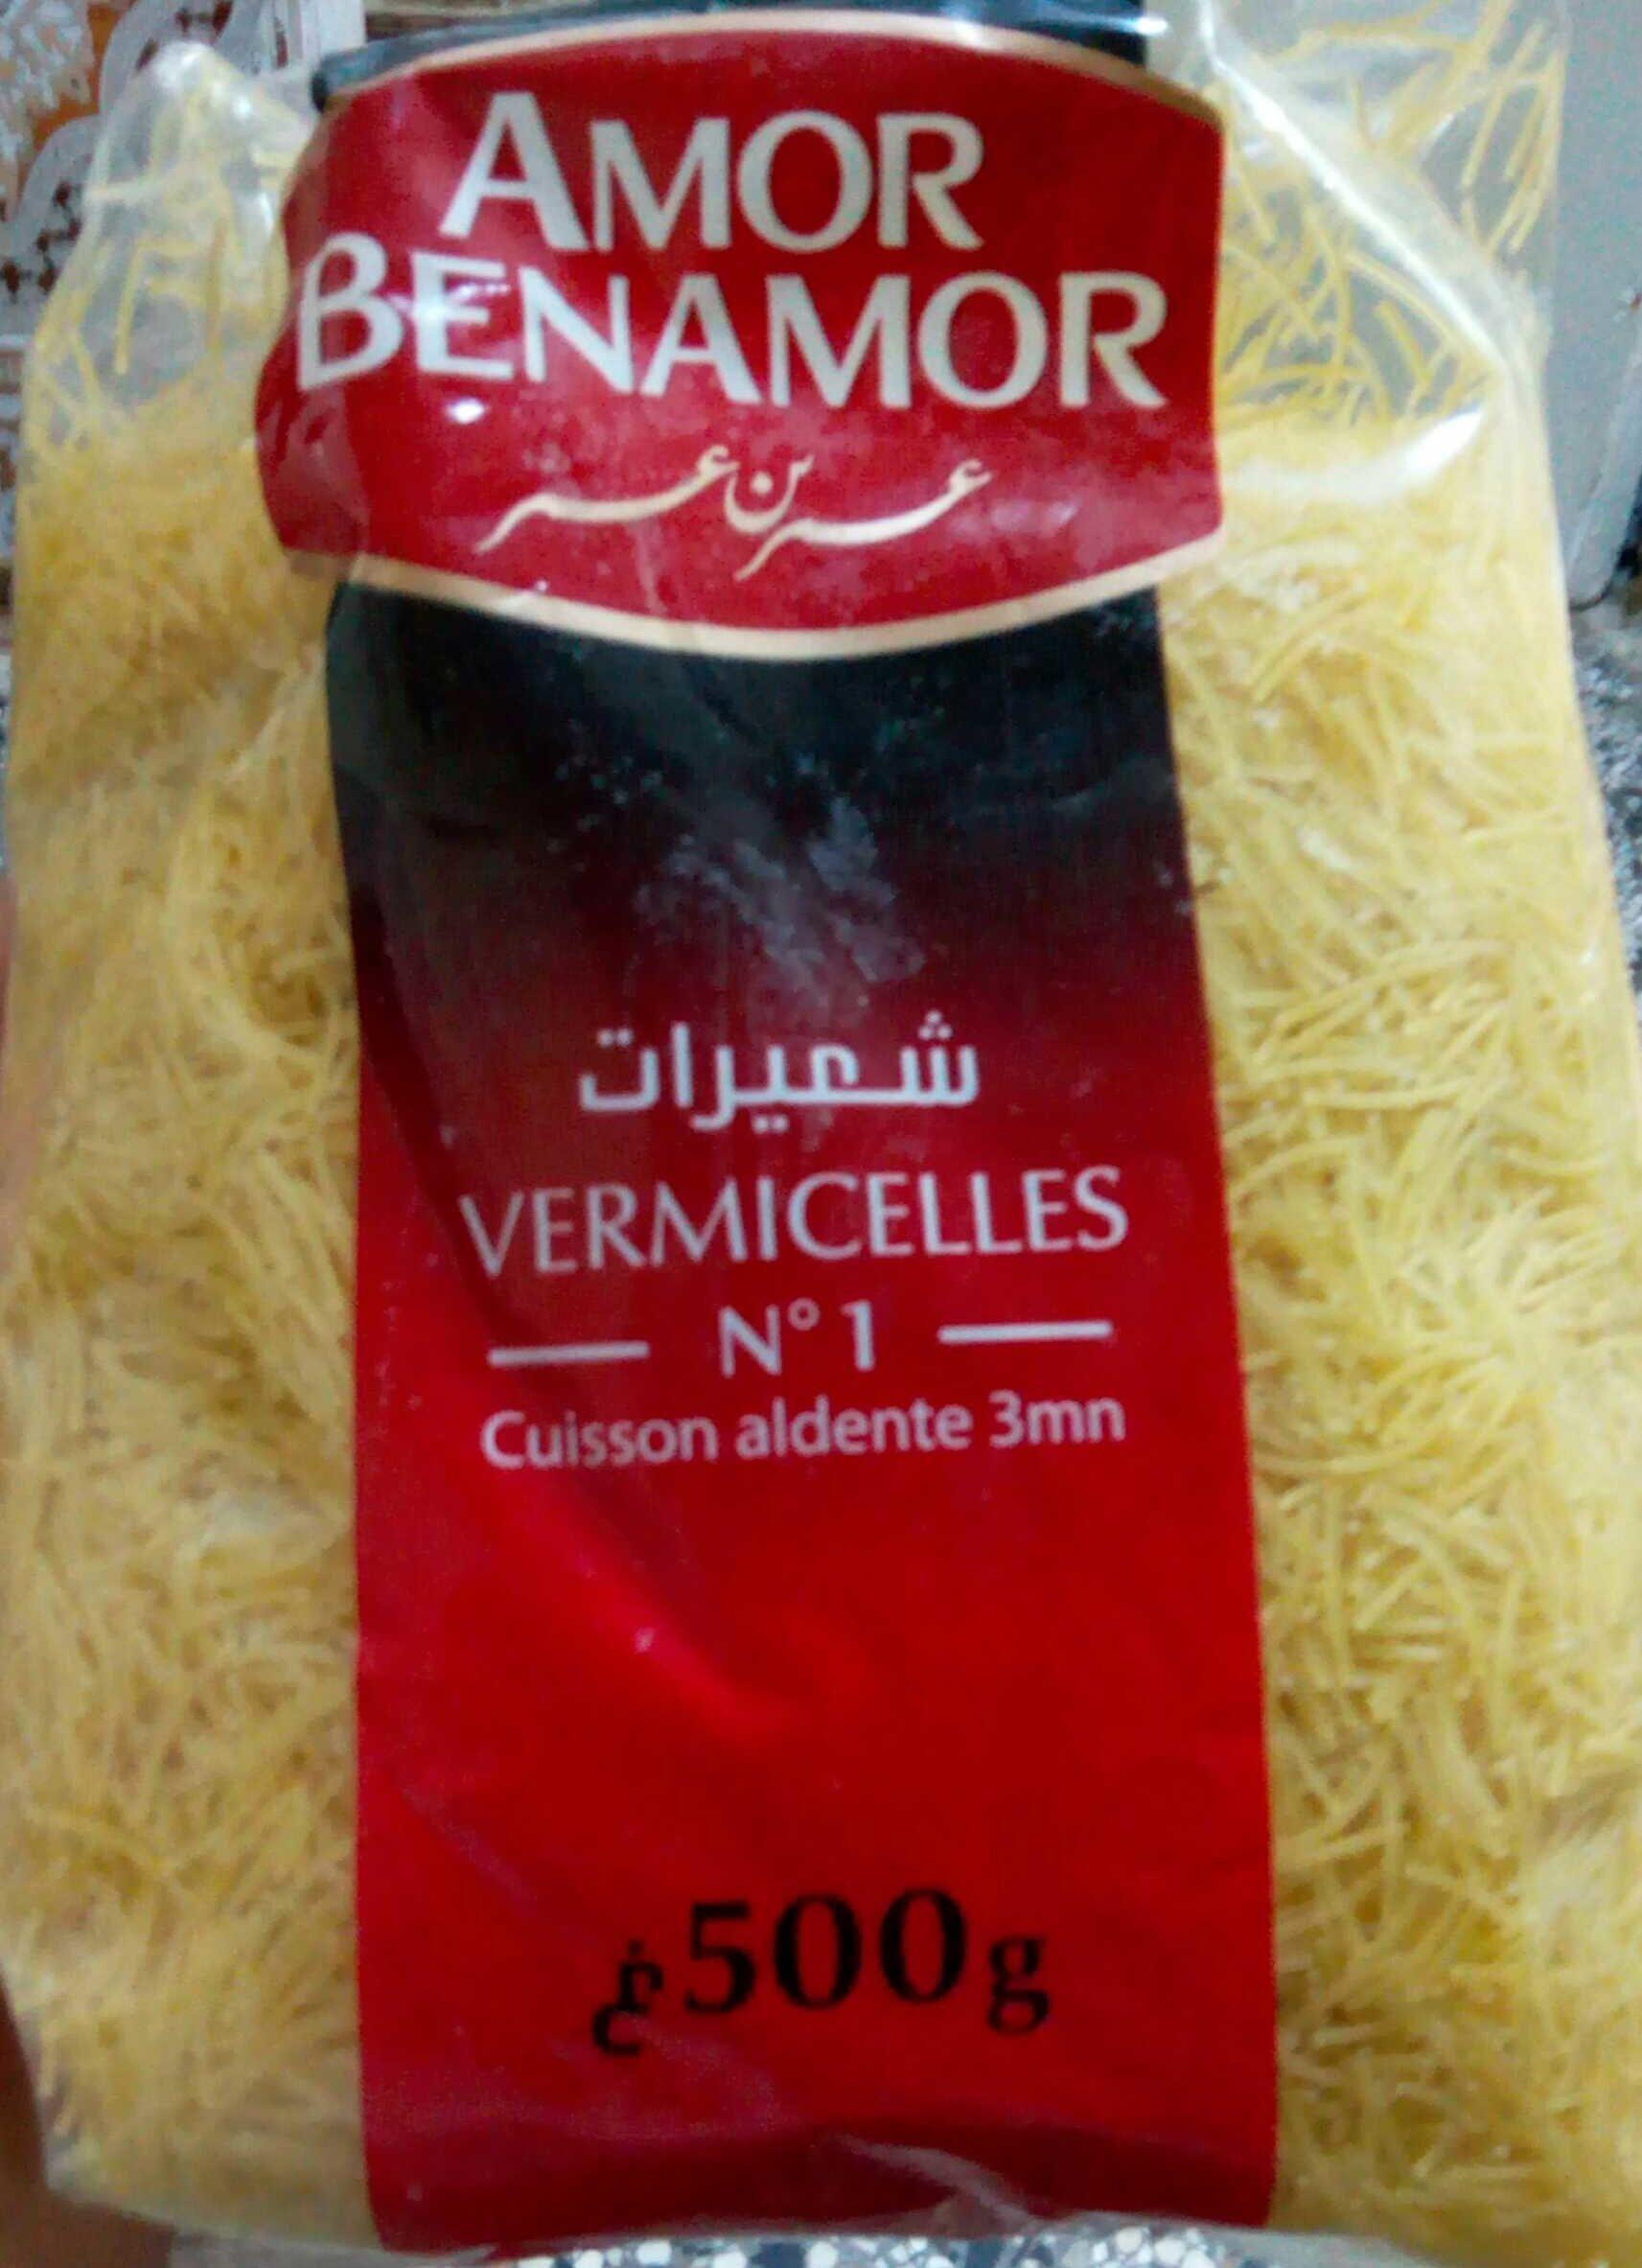 Vermicelles Amor Benamor - Product - fr